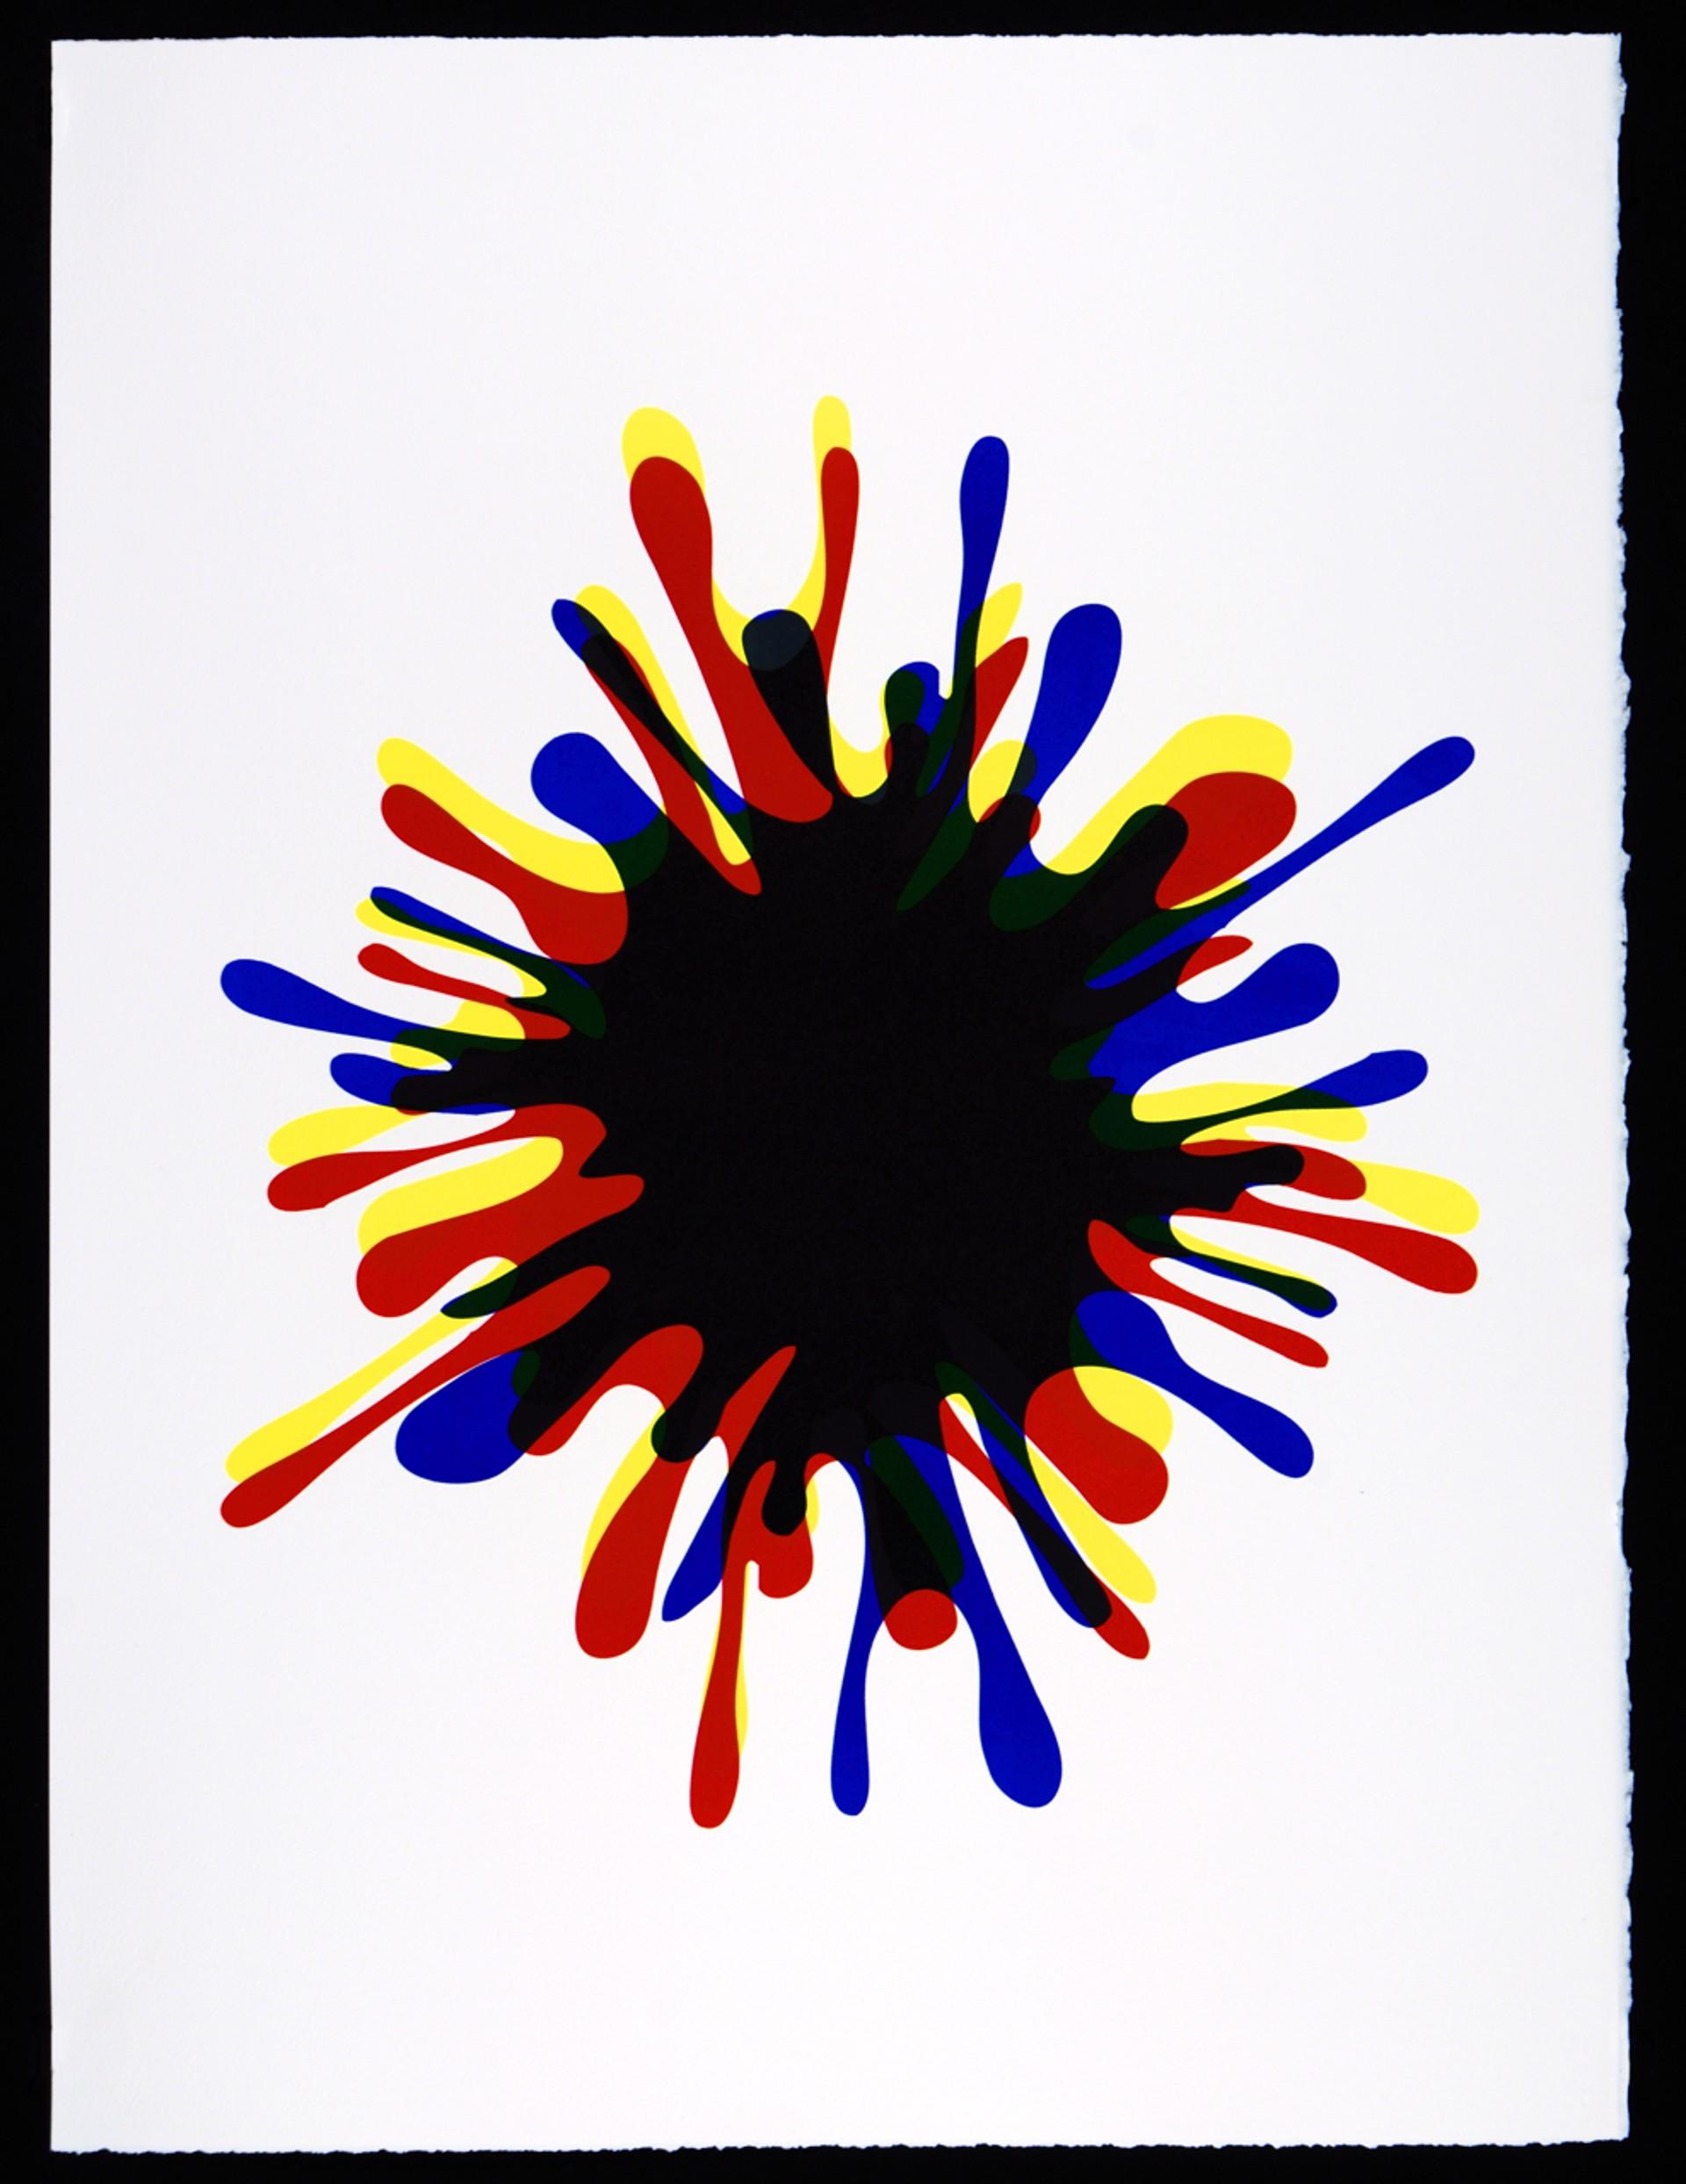 Spirale Blanche by John Armleder